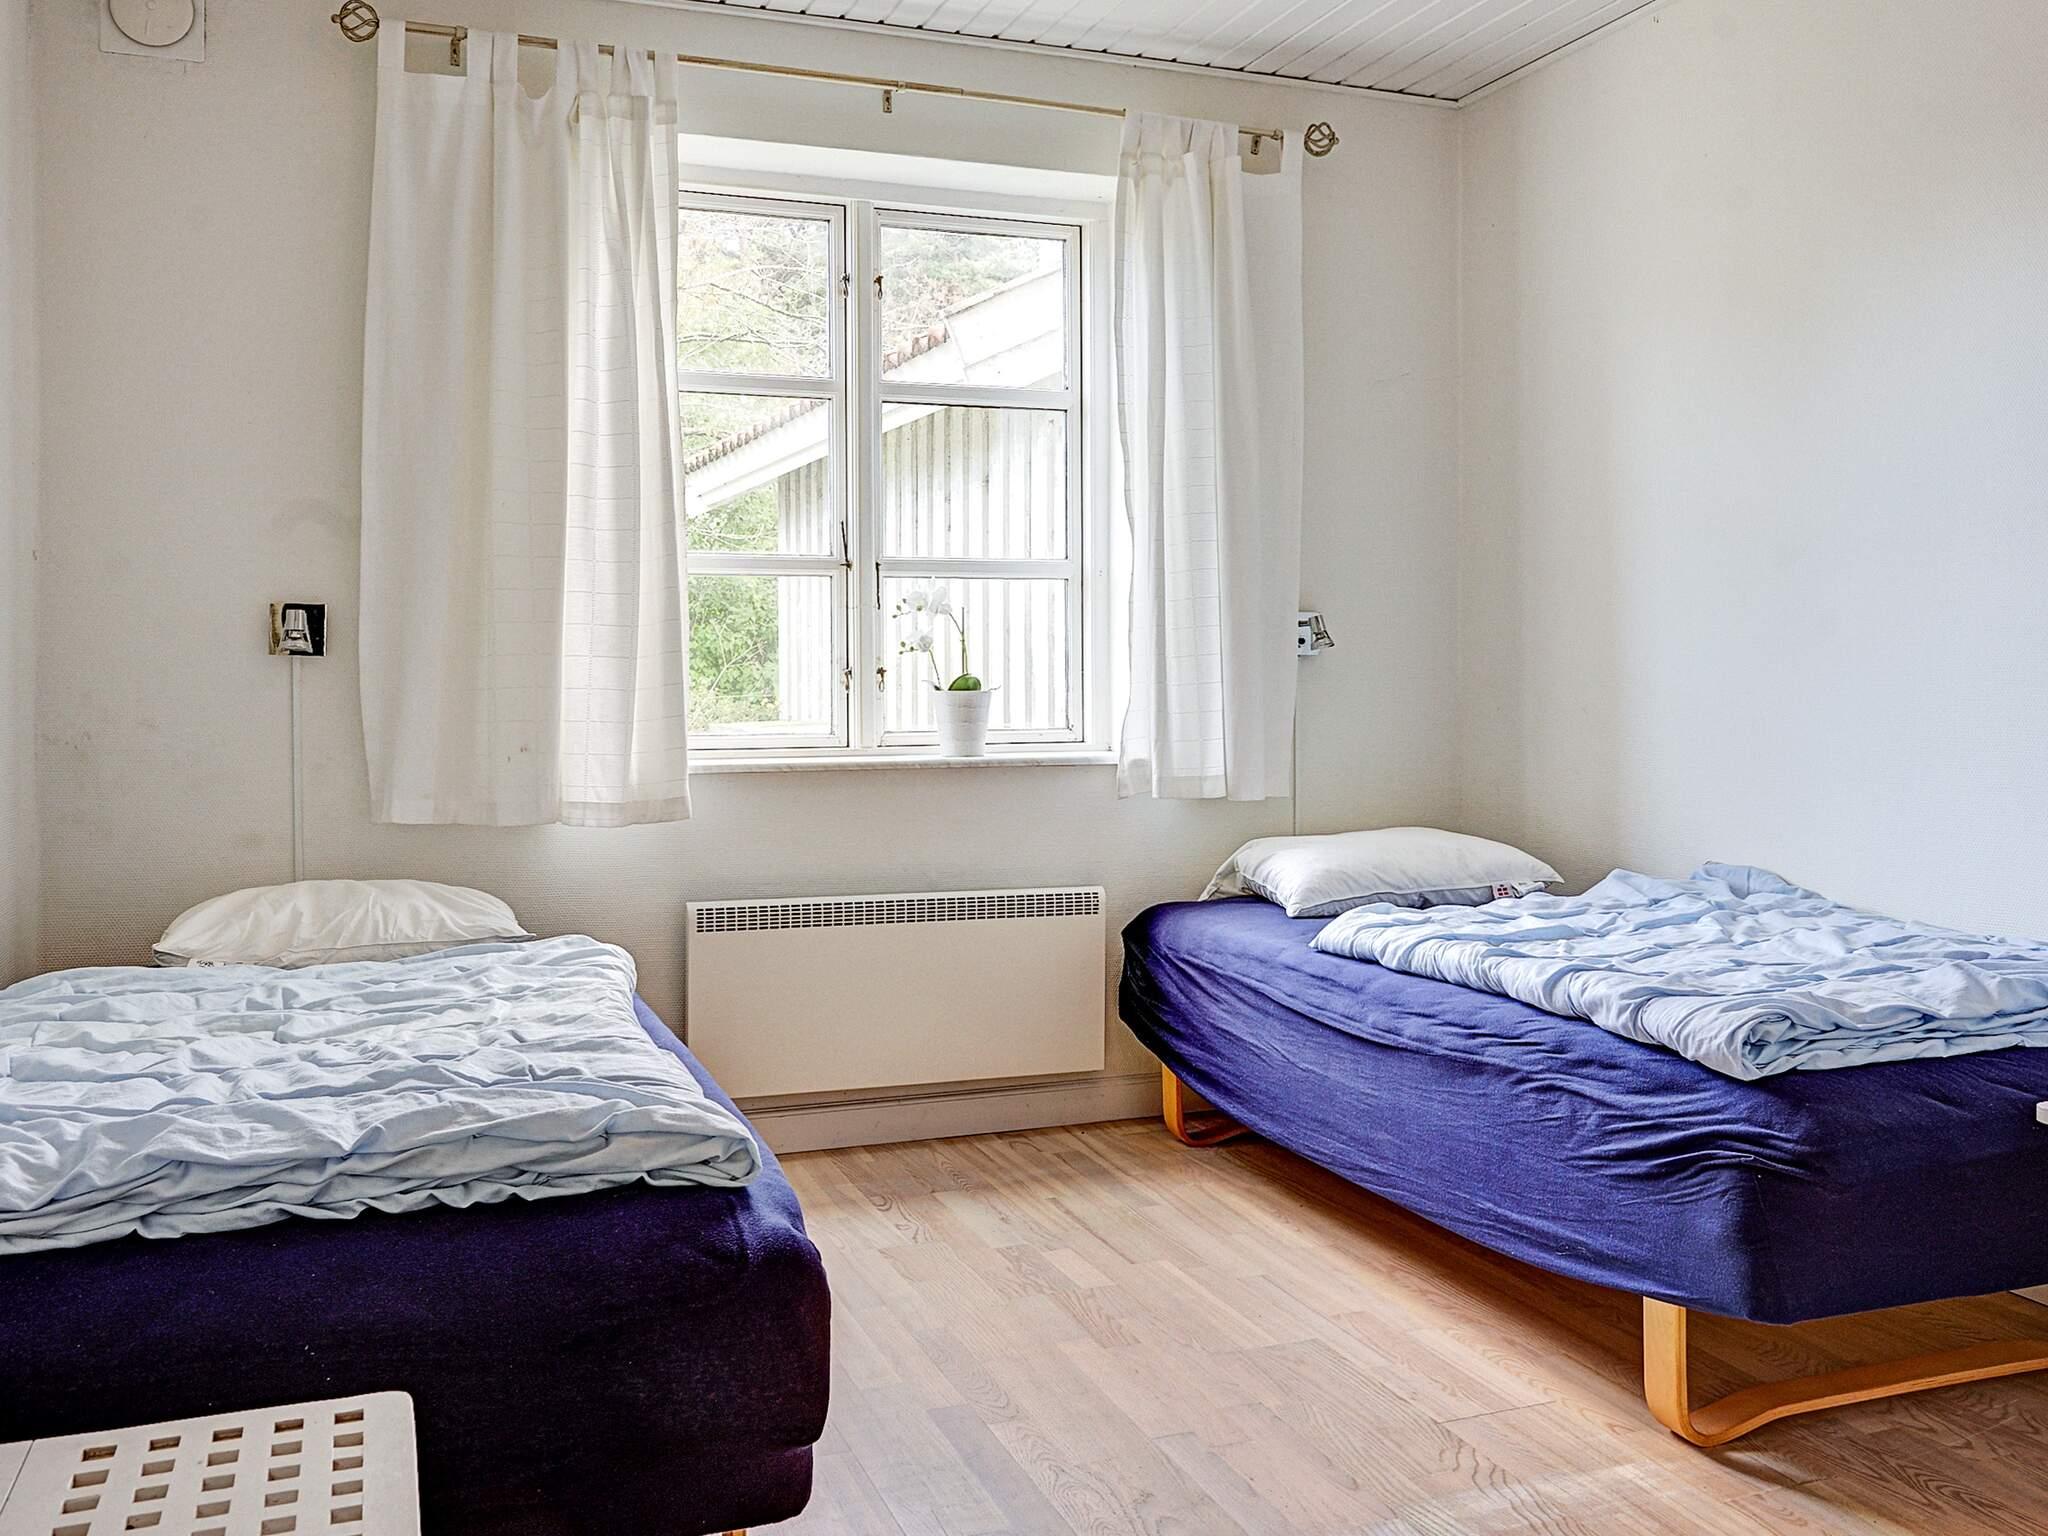 Ferienhaus Balka Strand (135786), Balke, , Bornholm, Dänemark, Bild 12